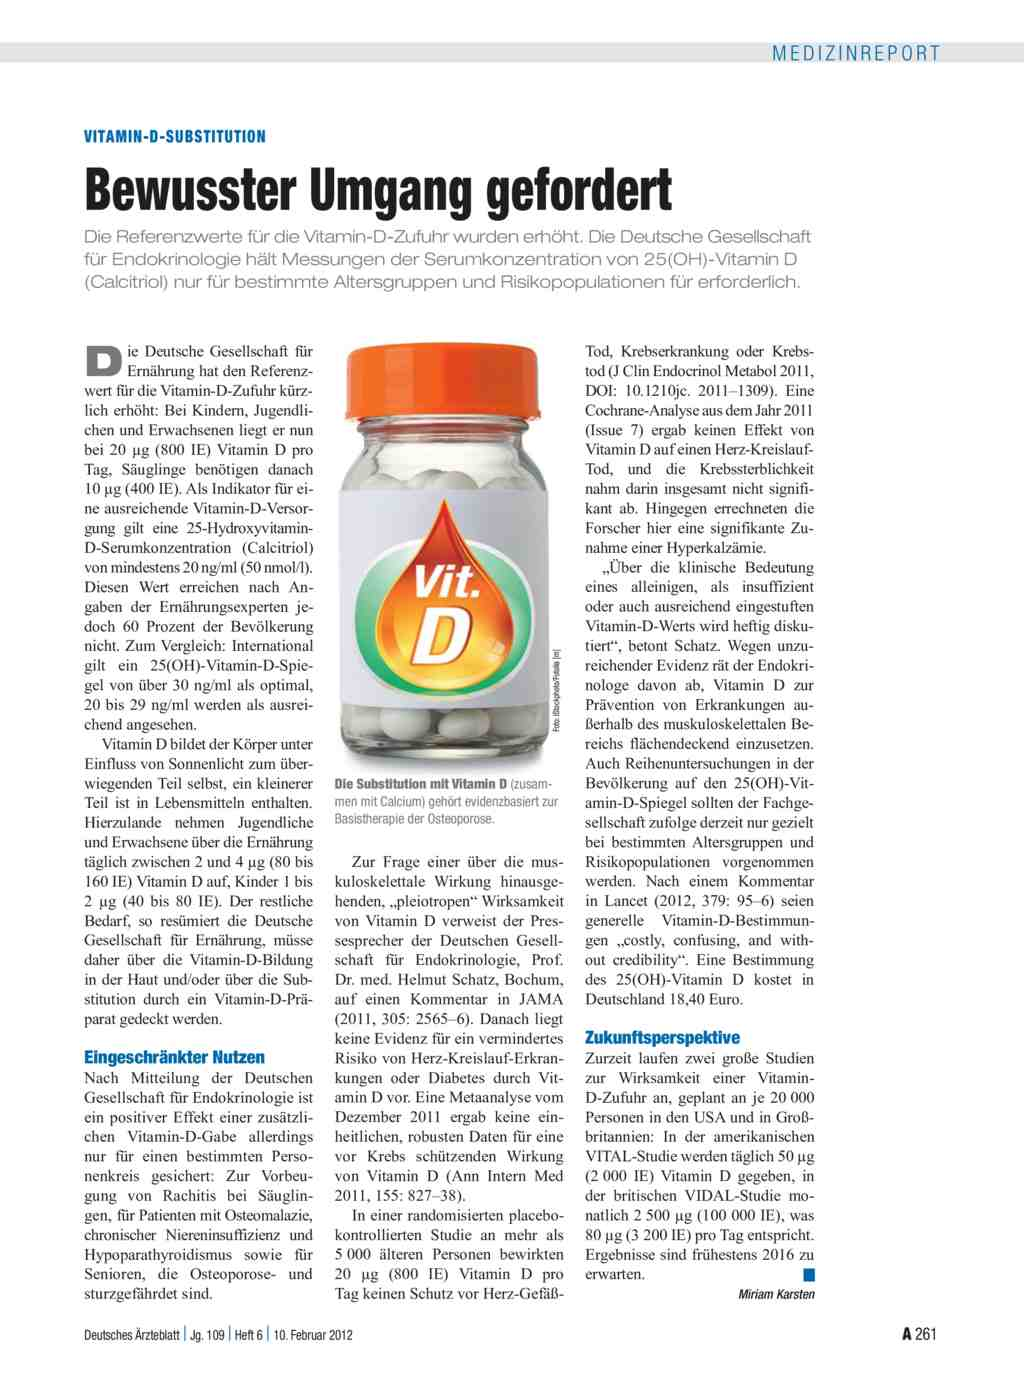 Vitamin D Substitution Bewusster Umgang Gefordert